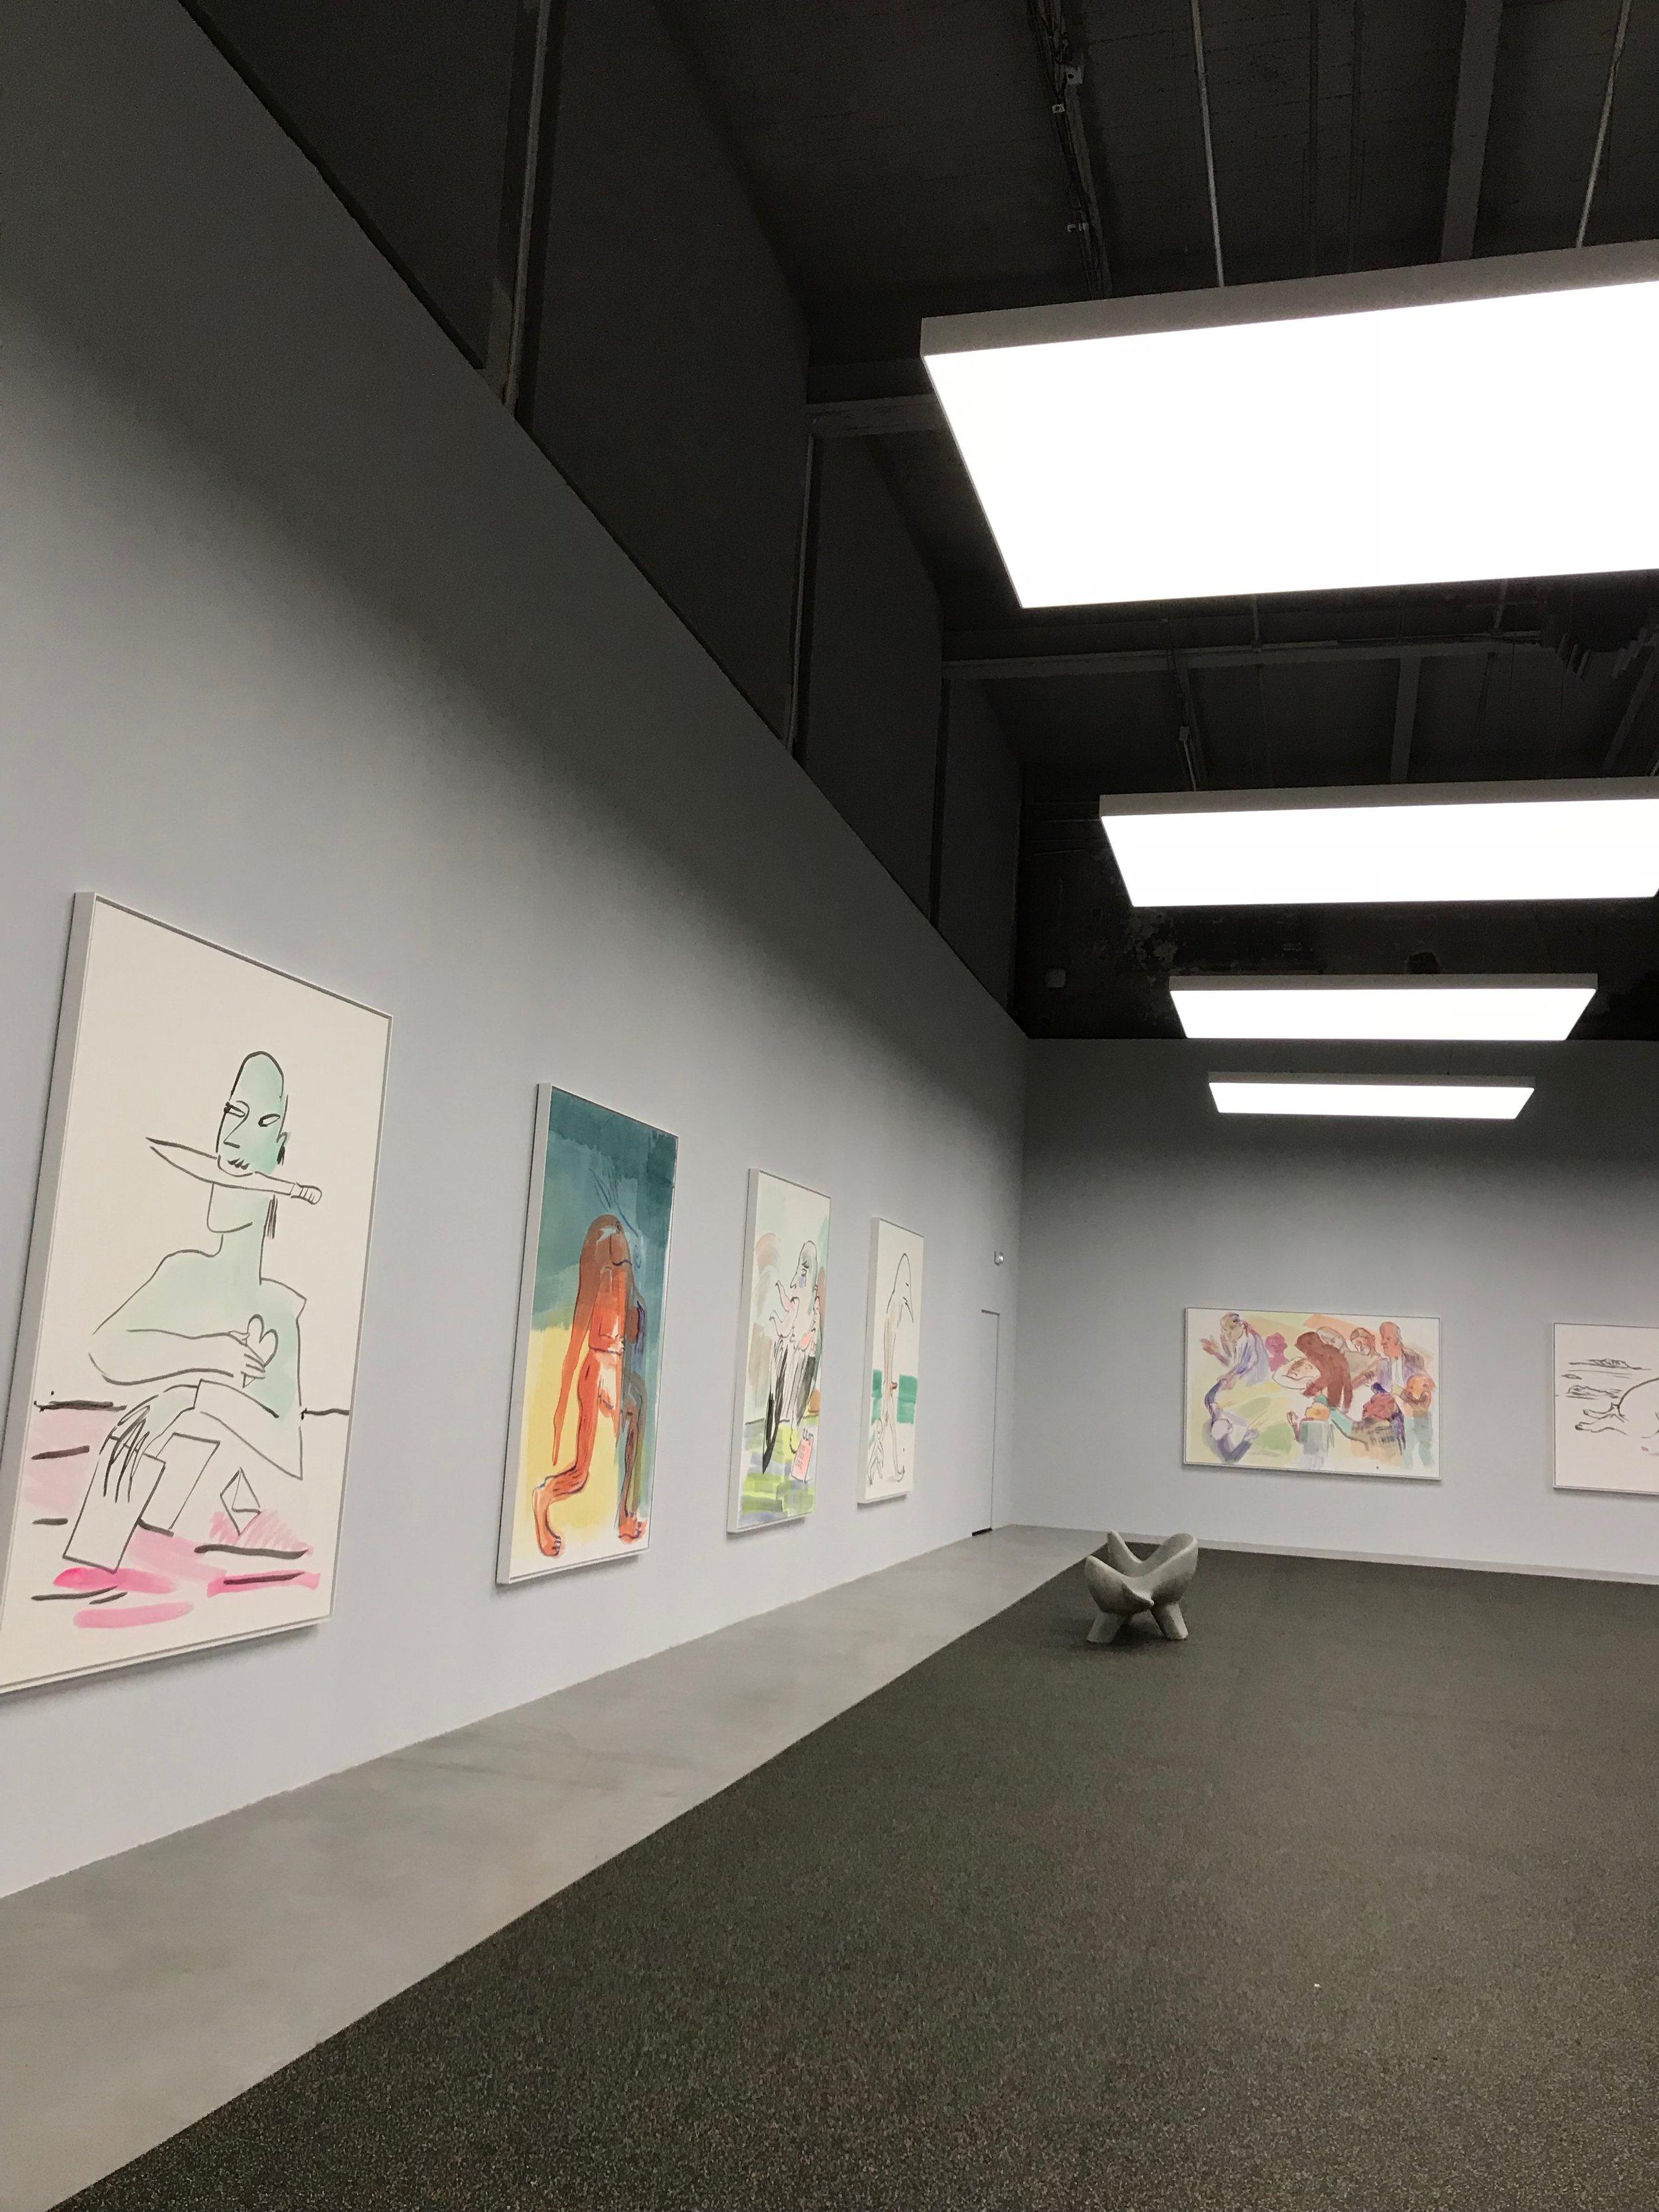 Camille Henrot's    Wednesday room   , Palais de Tokyo, 2017